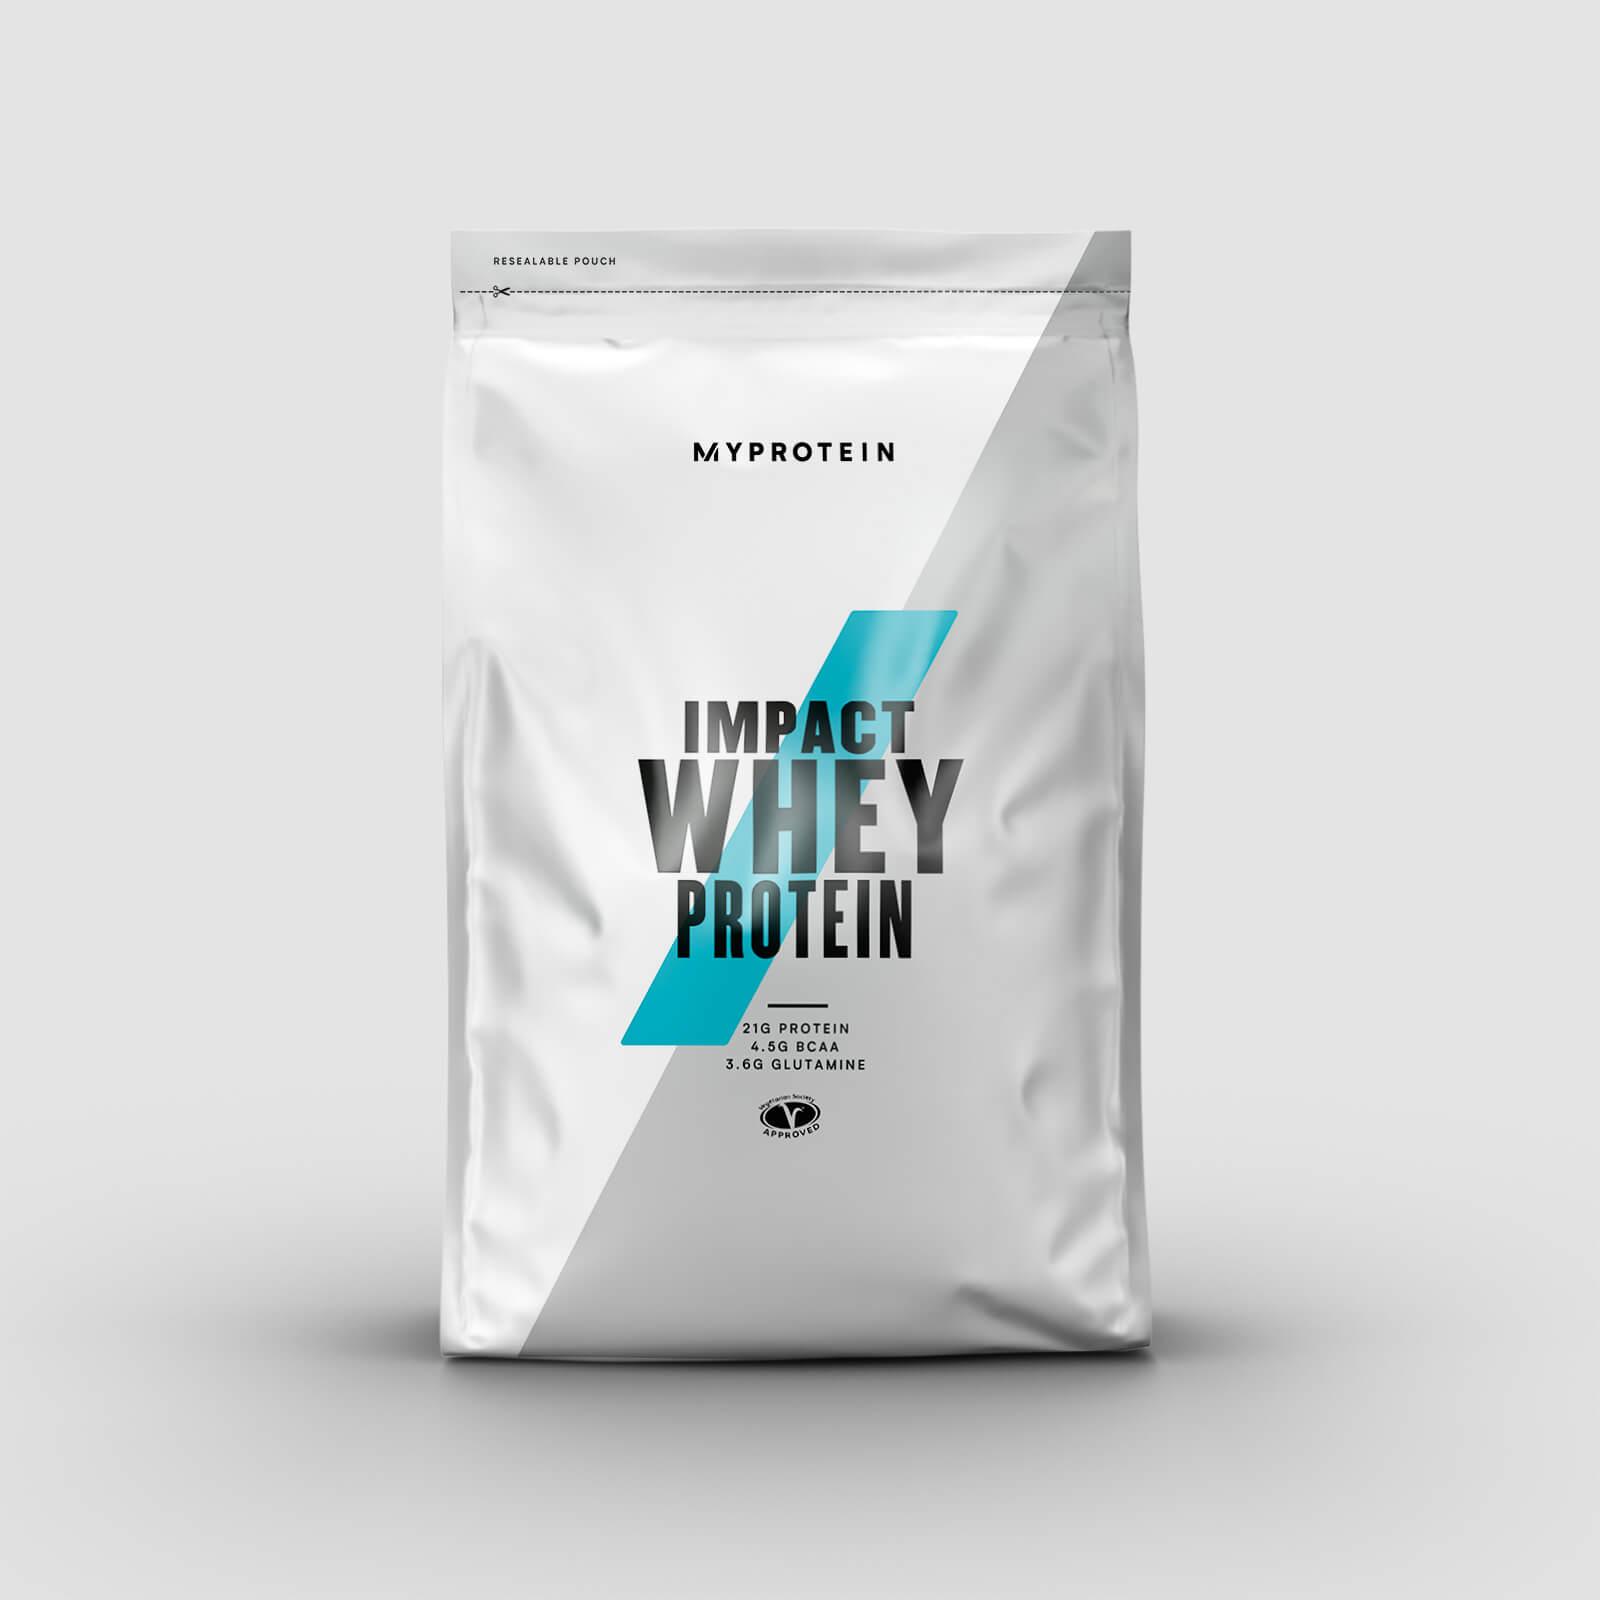 Myprotein Impact Whey Protein - 2.5kg - Chocolat Caramel